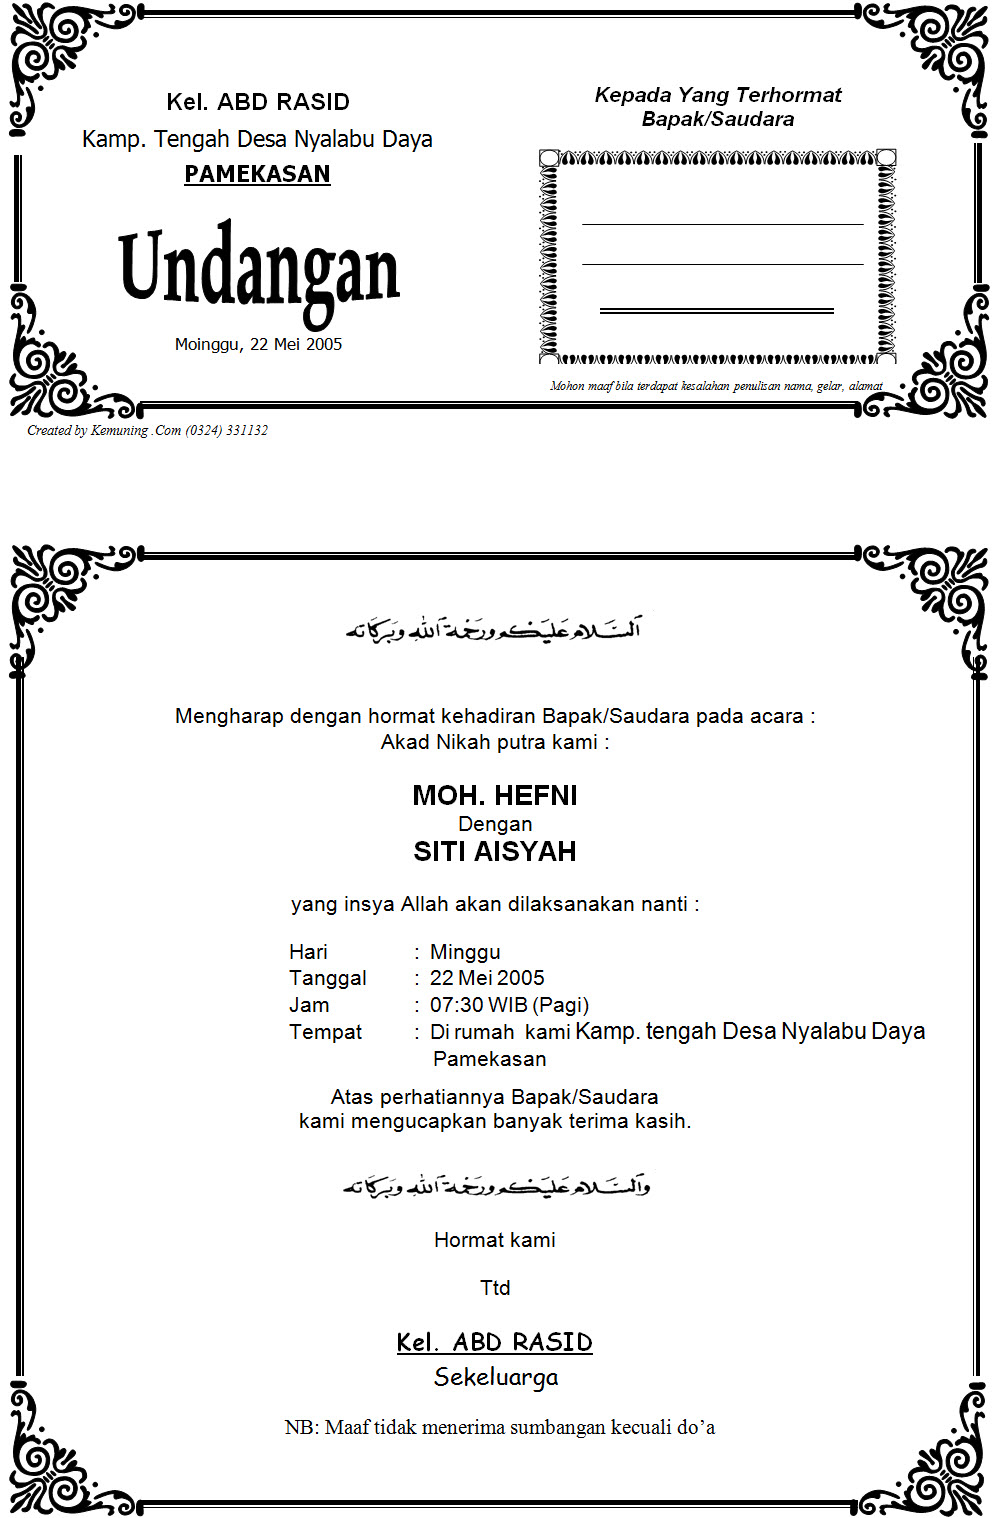 Download Contoh Undangan Akad Nikah